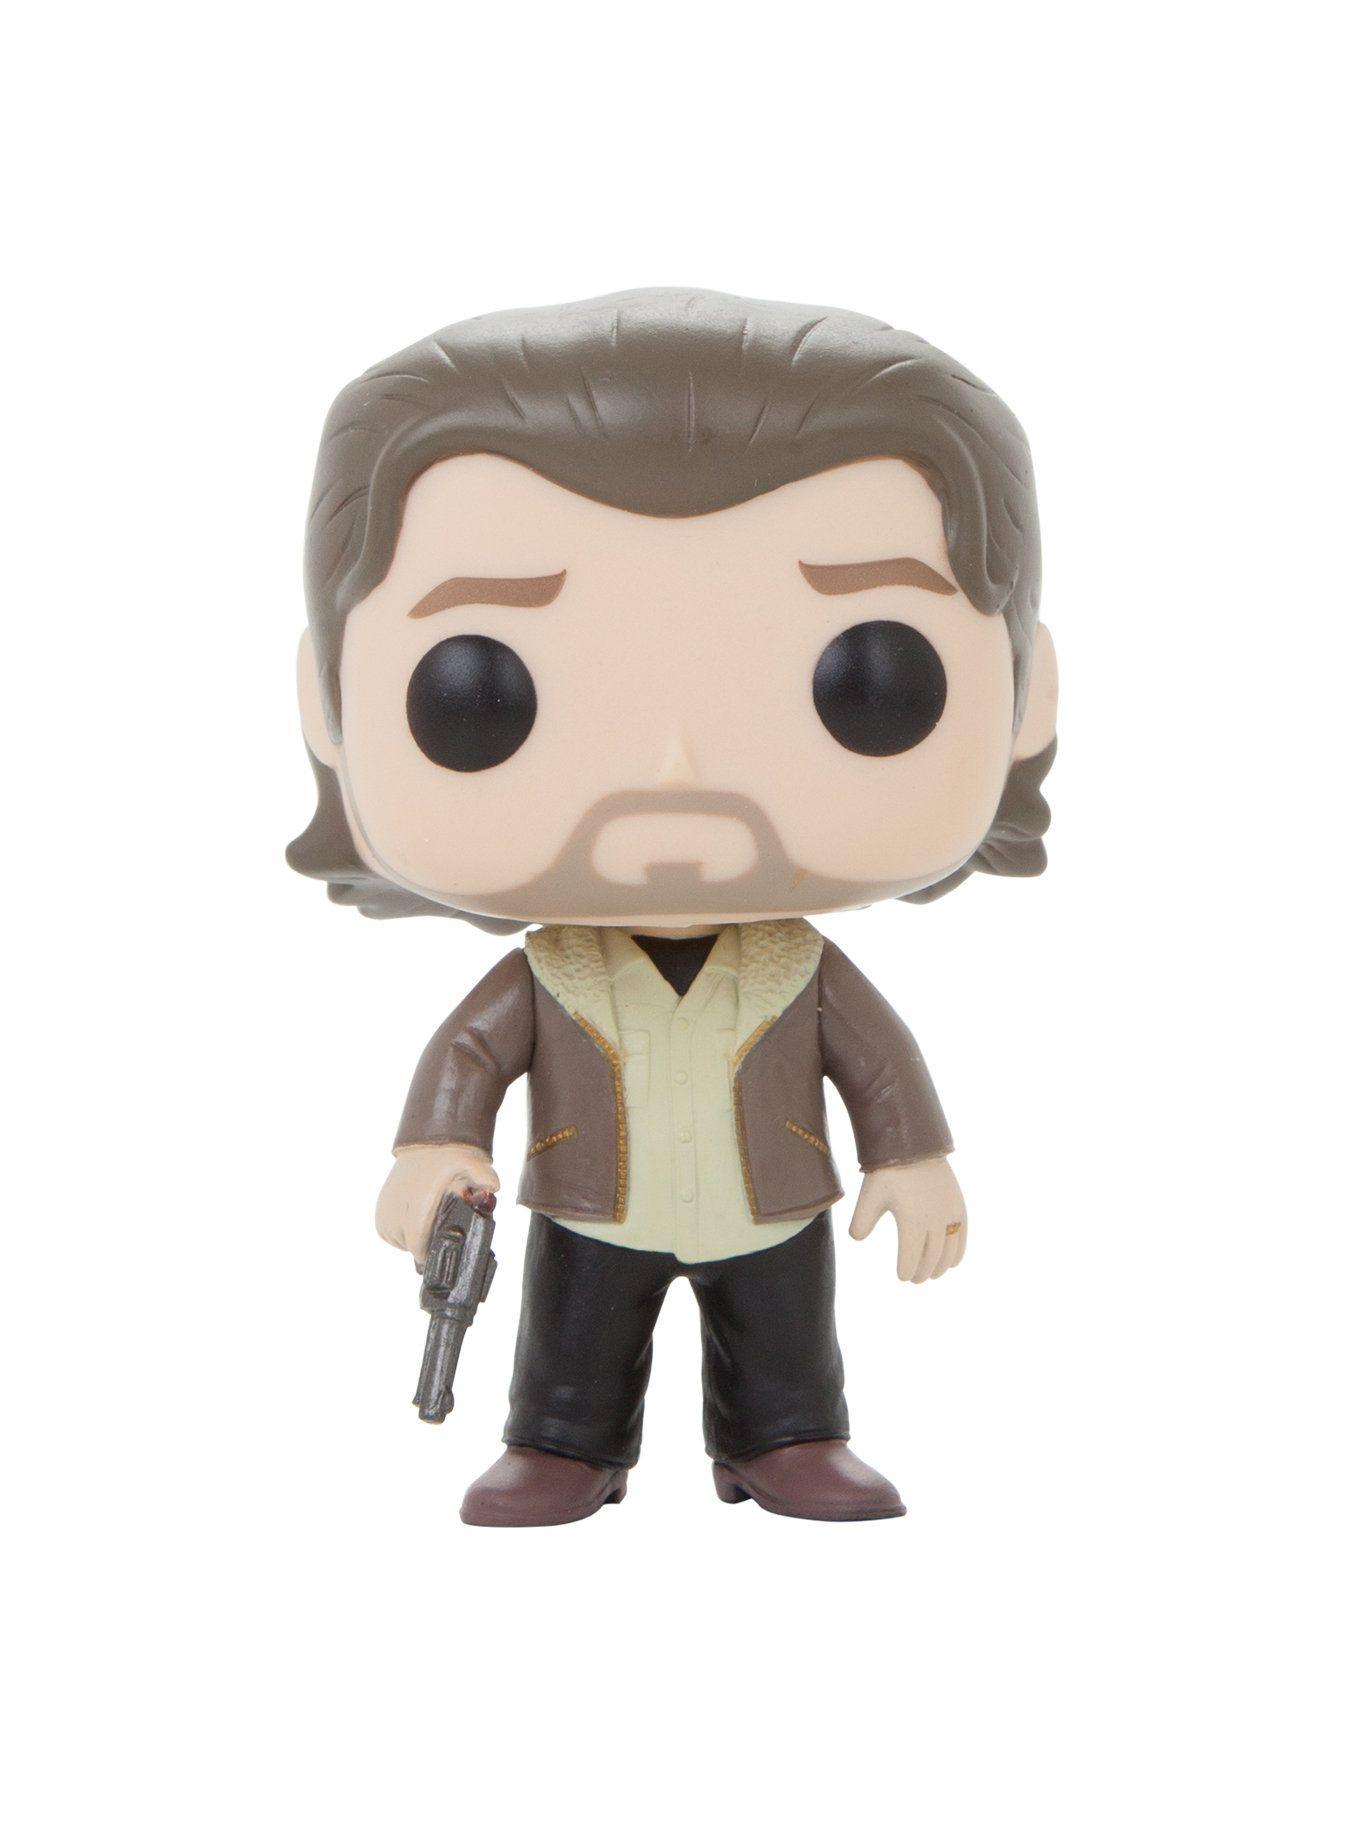 Rick Grimes #306 - The Walking Dead - Funko Pop! Television